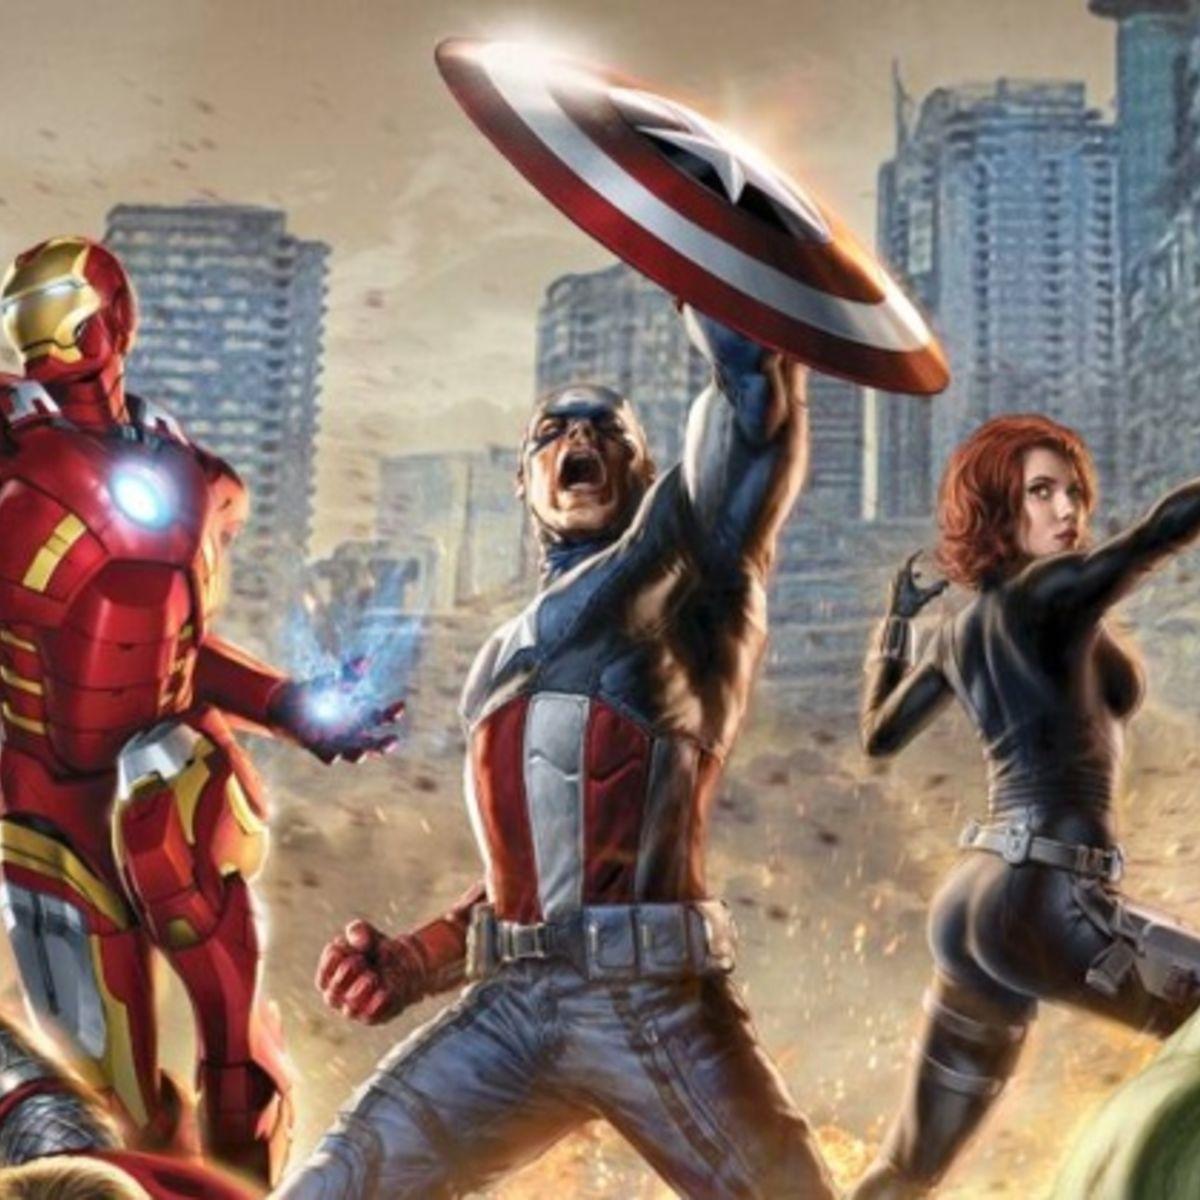 AvengersActionPromoArt1_1.jpg